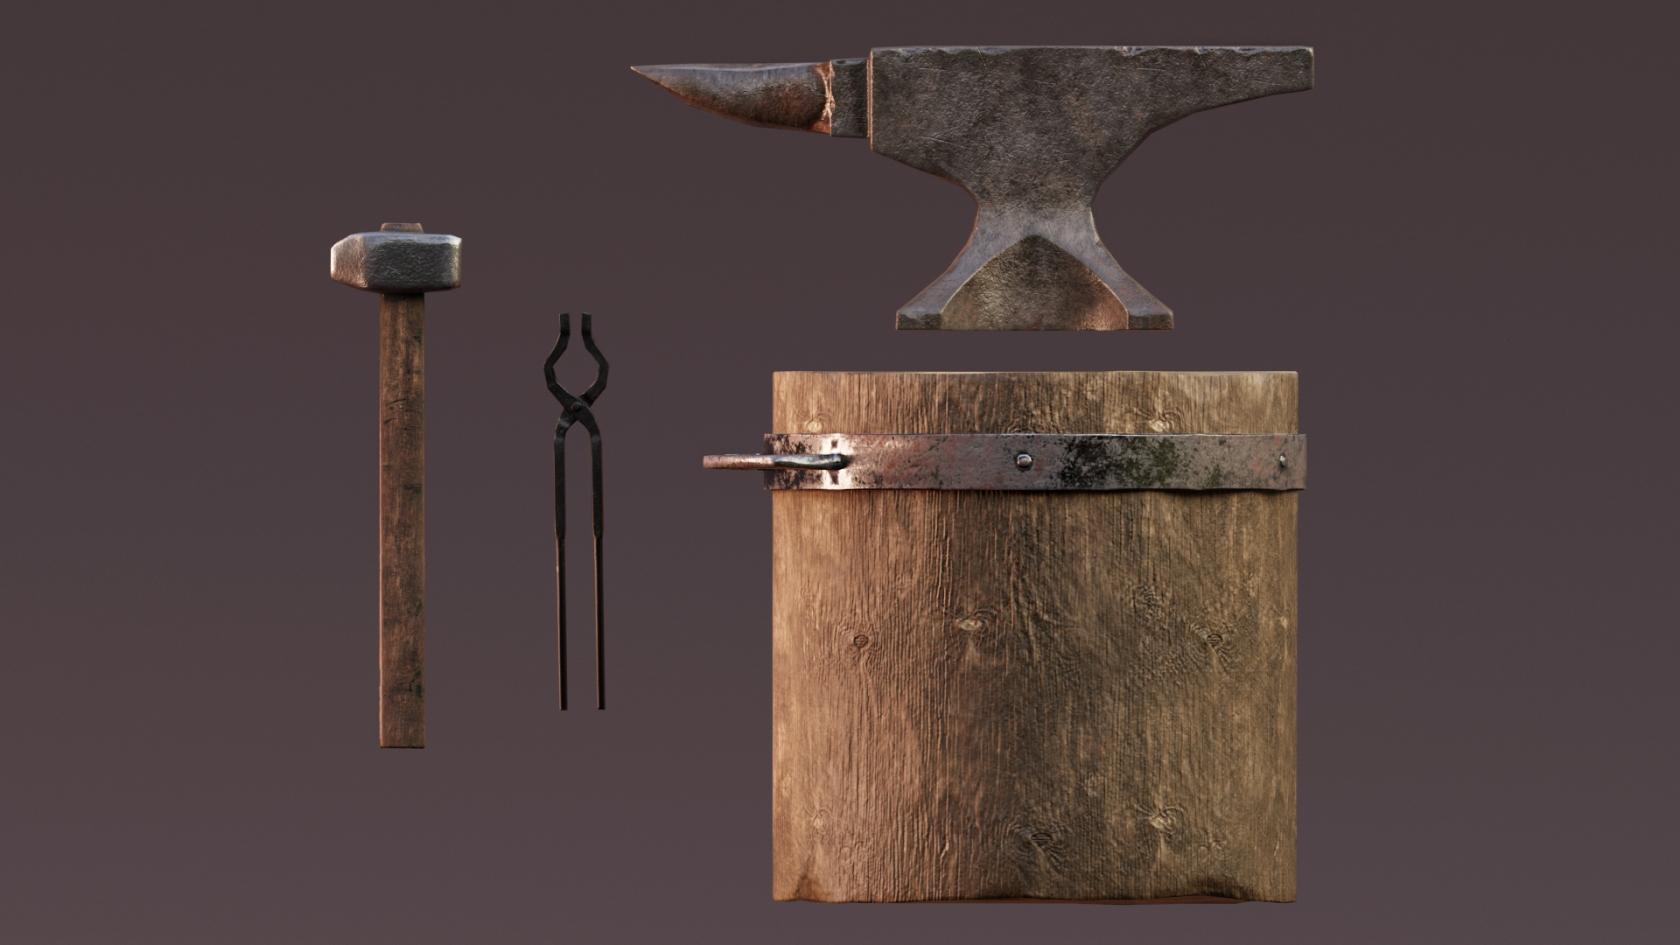 The blacksmith's set